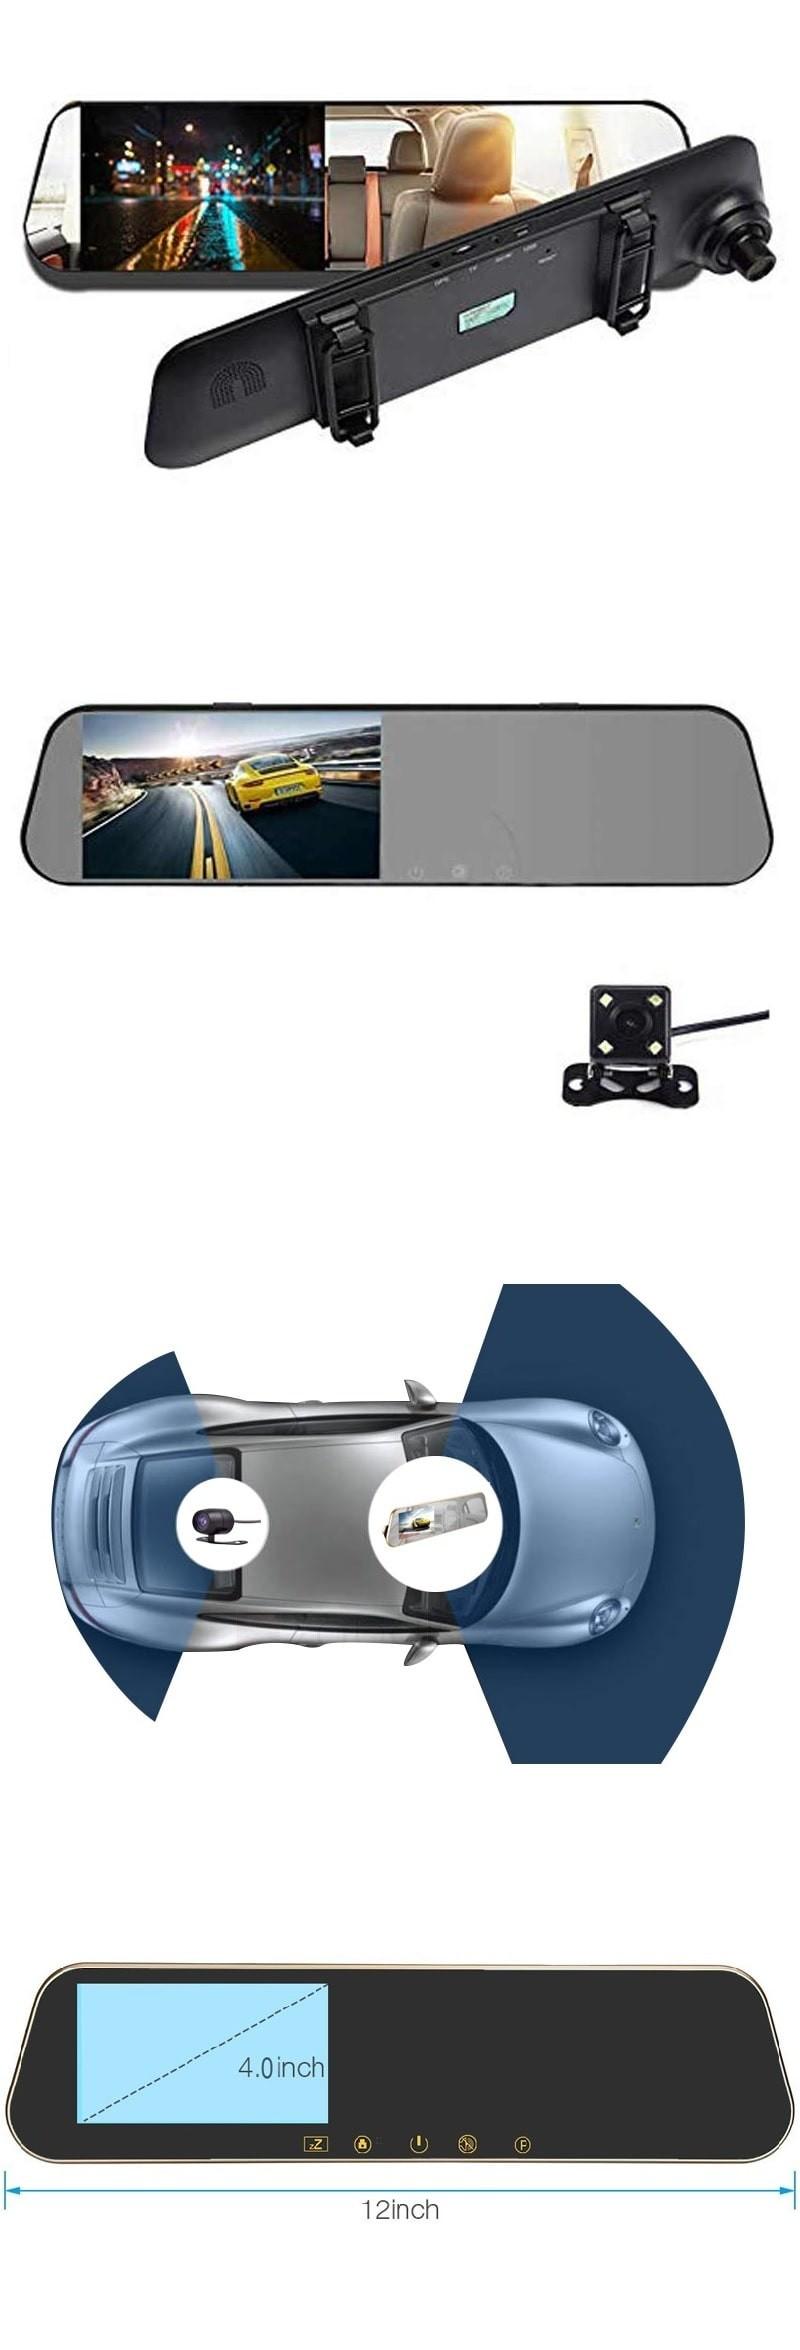 Prezentare-STAR-Smart-Roadwitness-SRW-M4Td9c1002424c82250.jpg